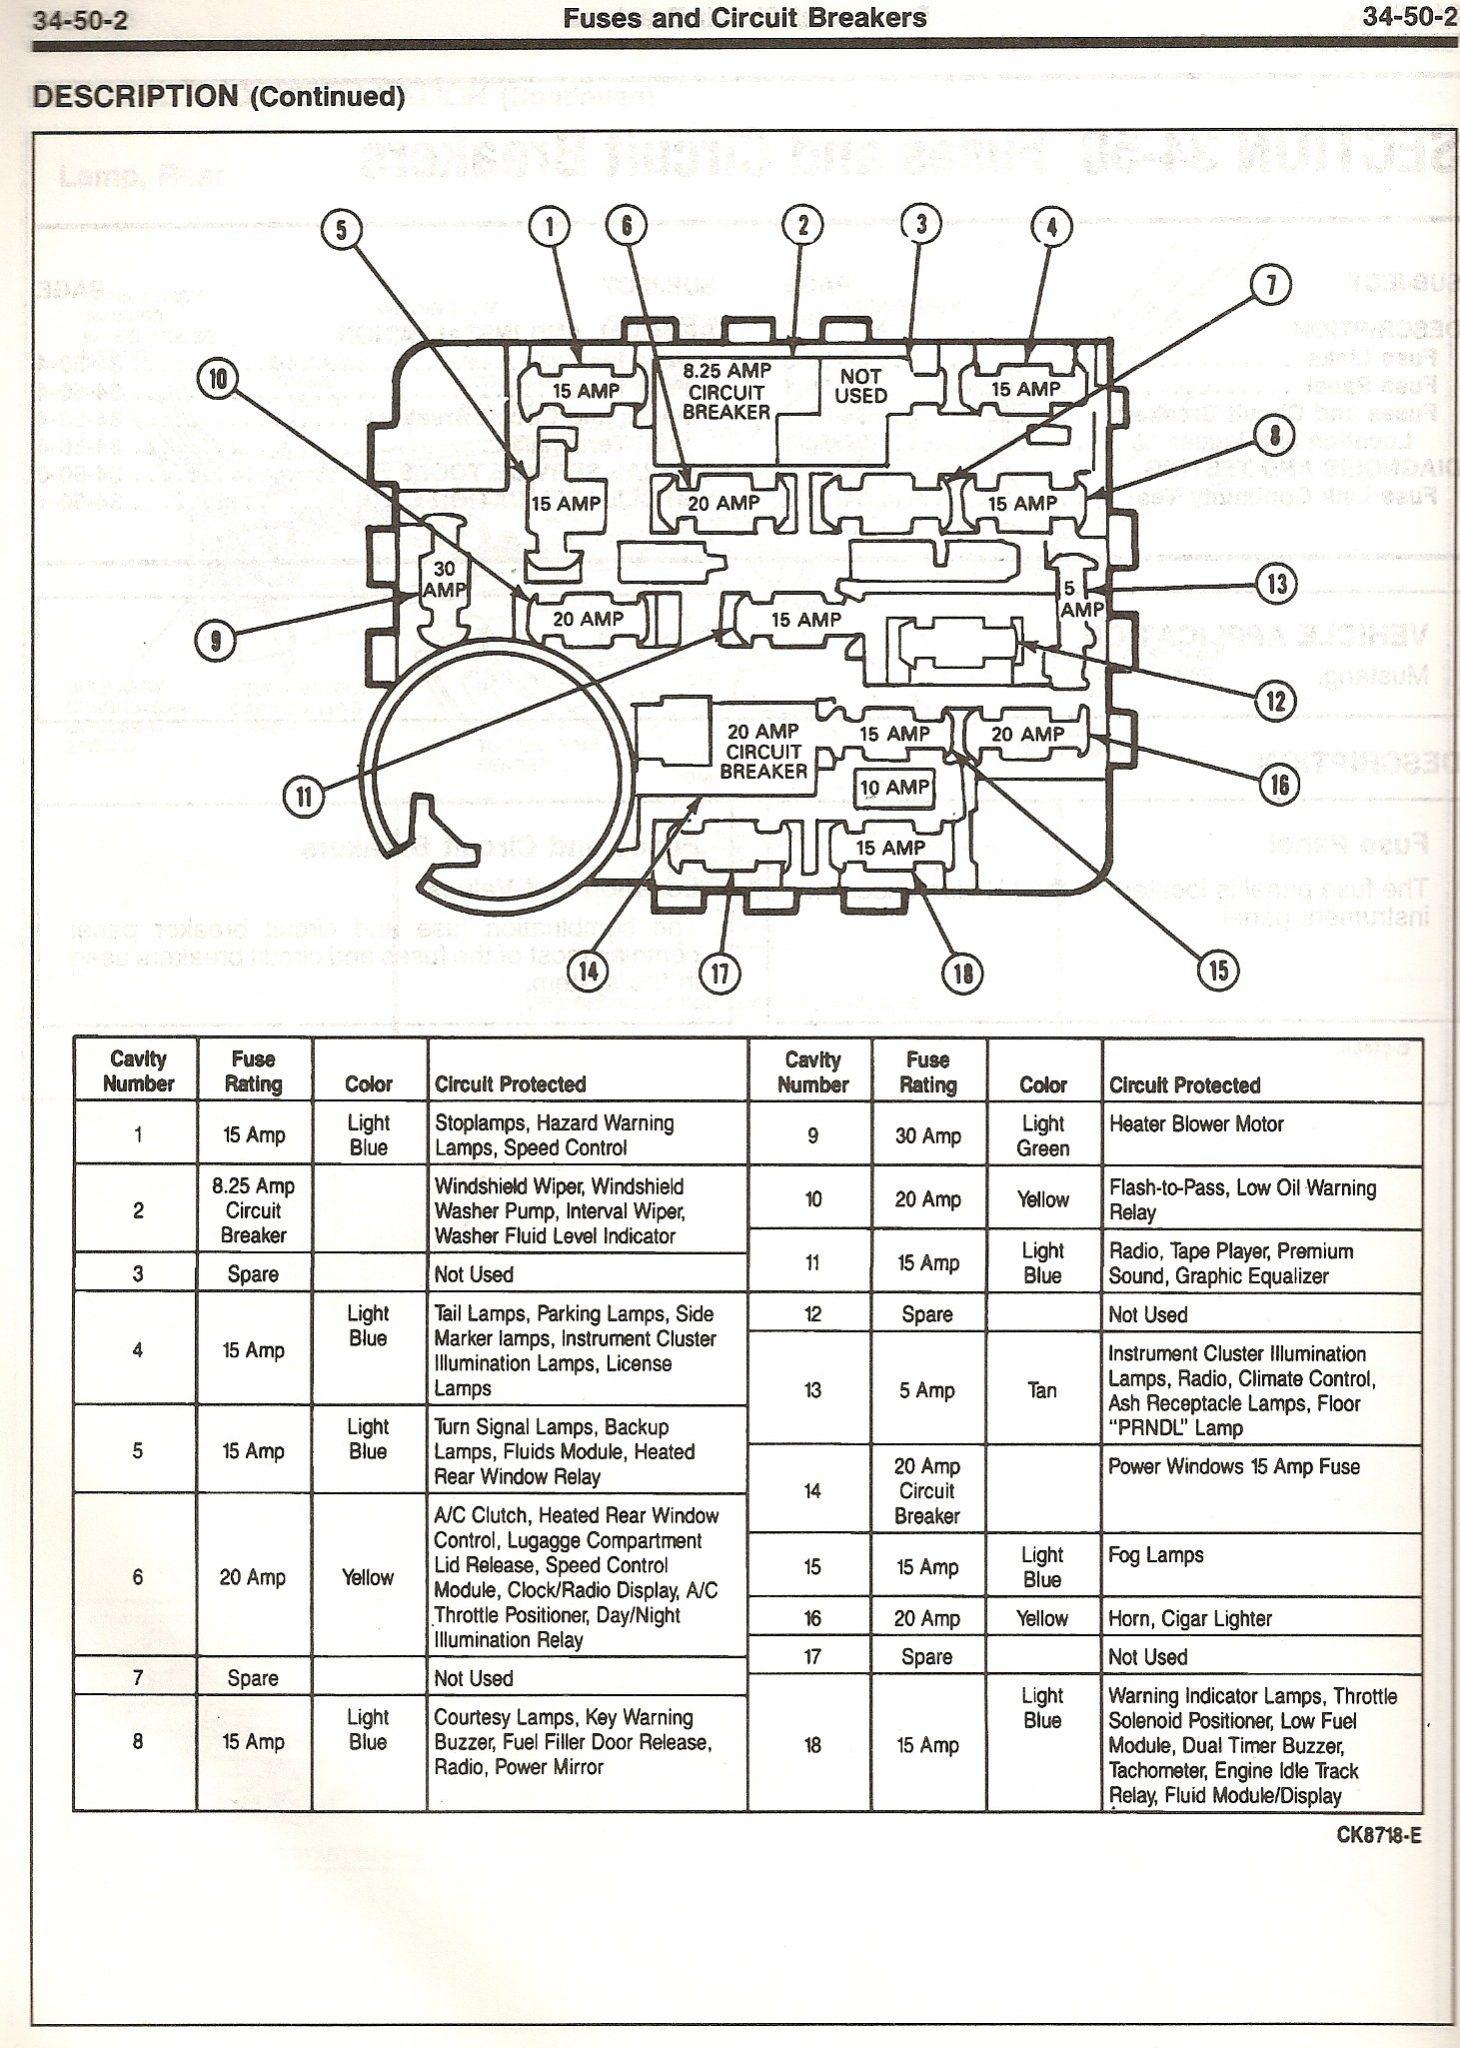 2008 Audi Tt Fuse Box Diagram 07 Chartsfree Images Peugeot Partner Tepee 1990 2 3l Mustang Engine Bay D 855 41